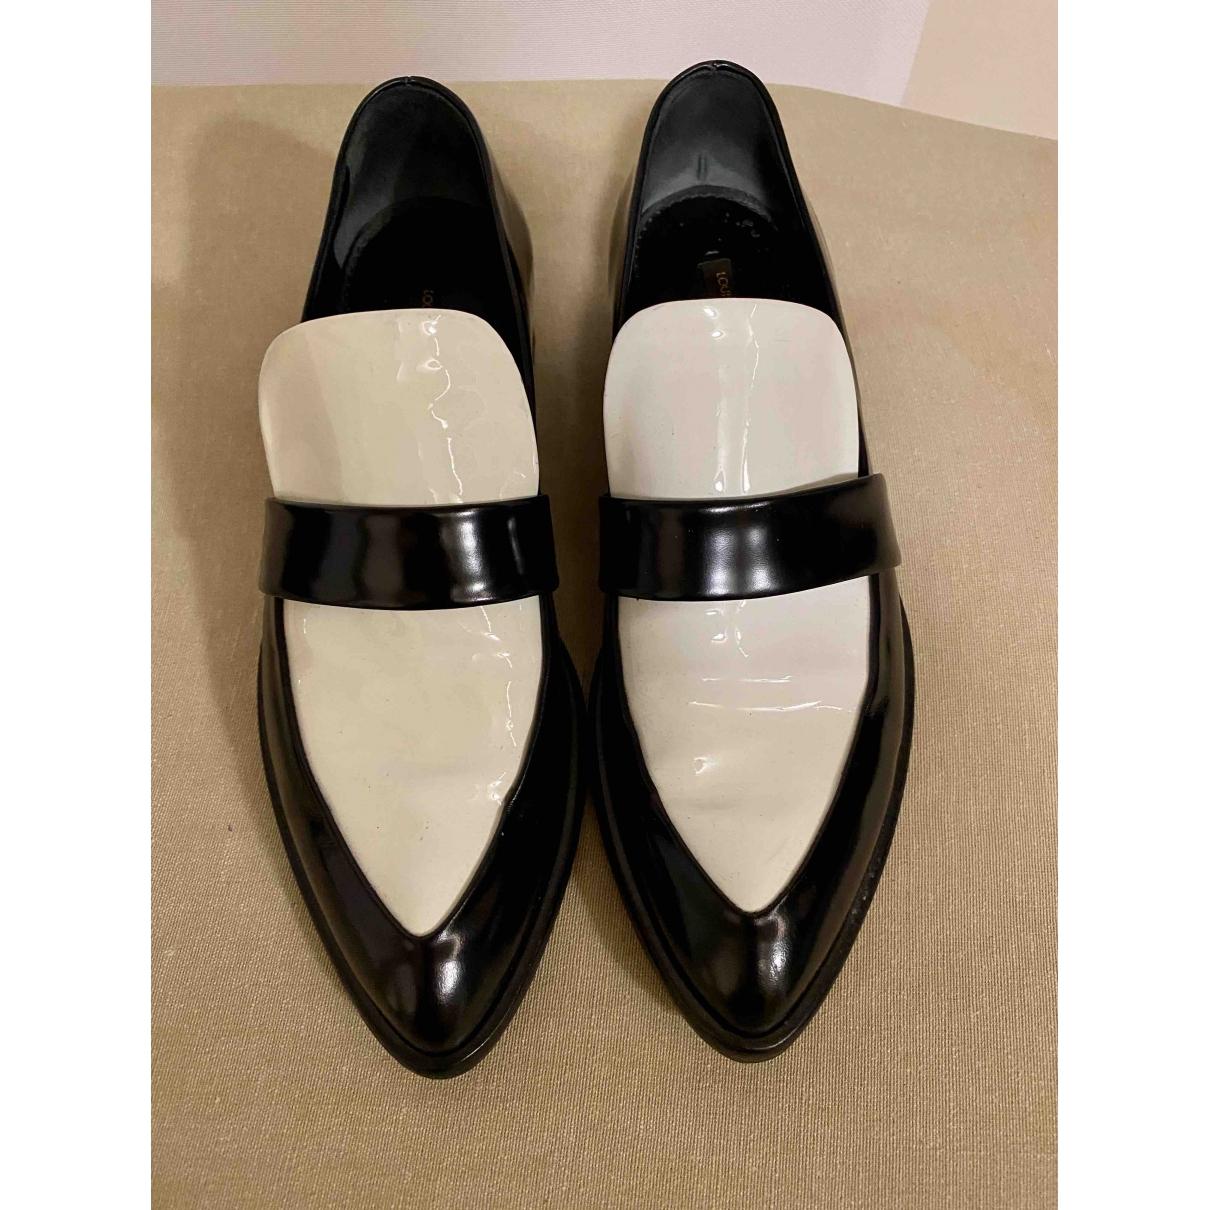 Louis Vuitton \N Black Leather Flats for Women 38 EU